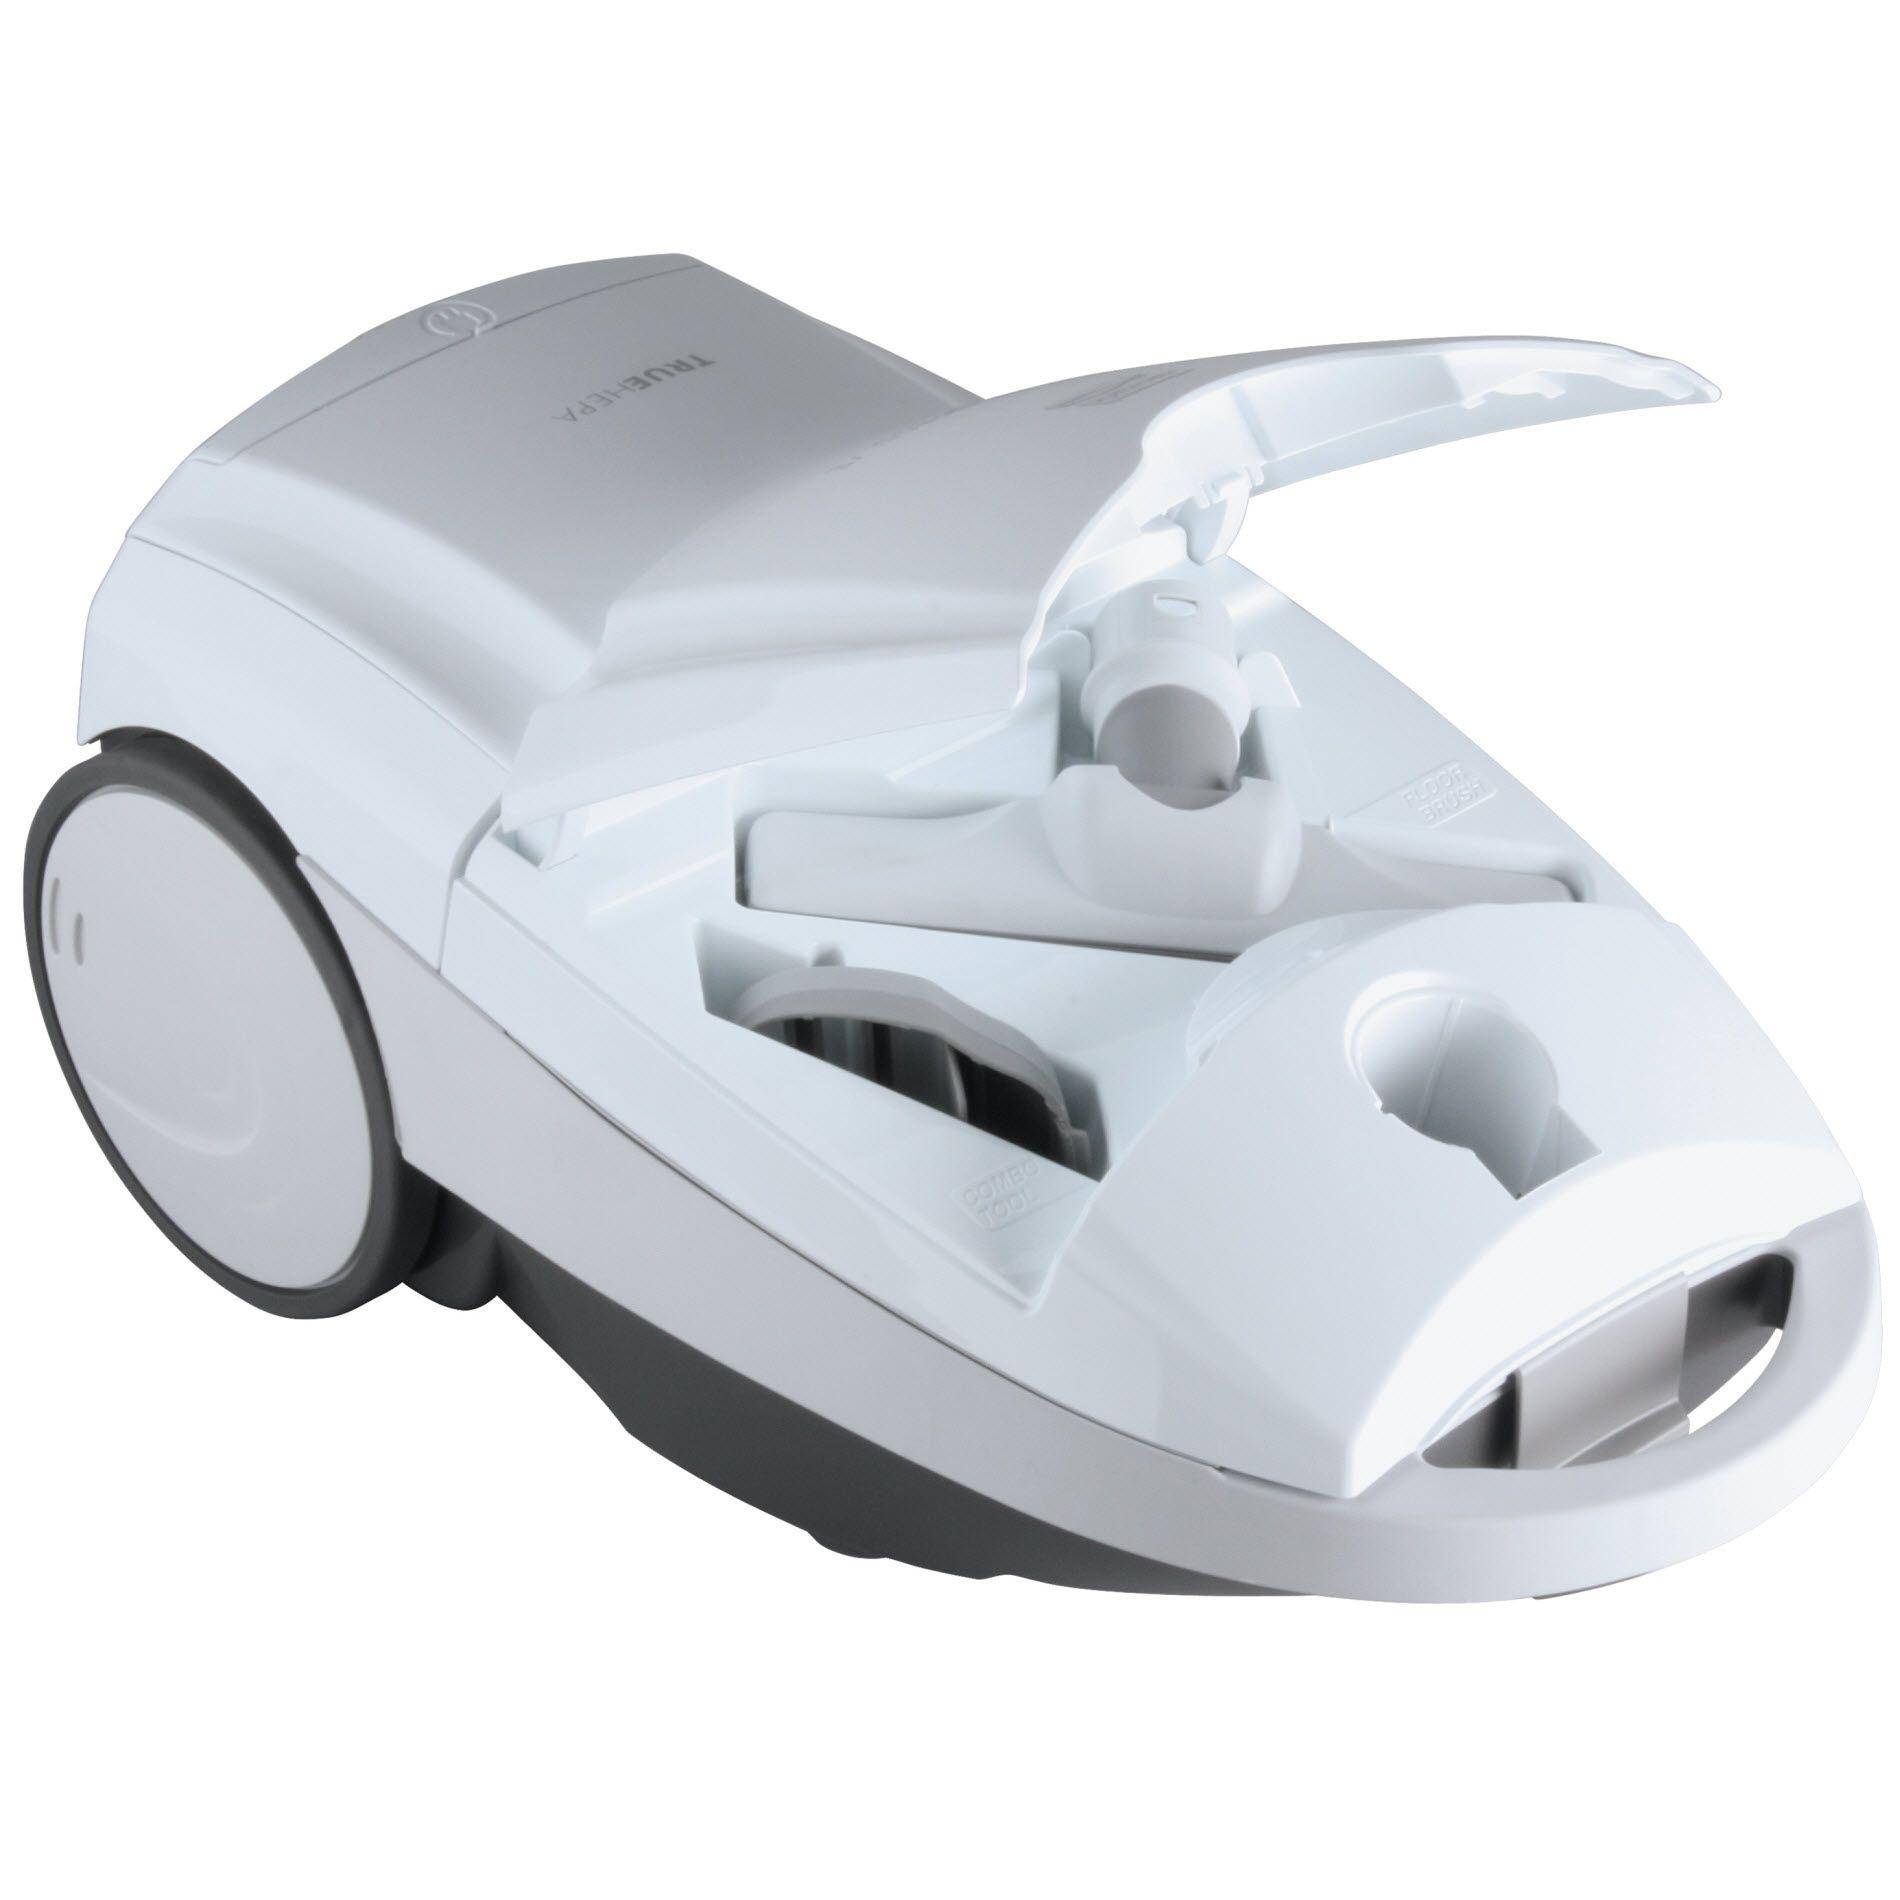 Kenmore Progressive Canister Vacuum Cleaner - White